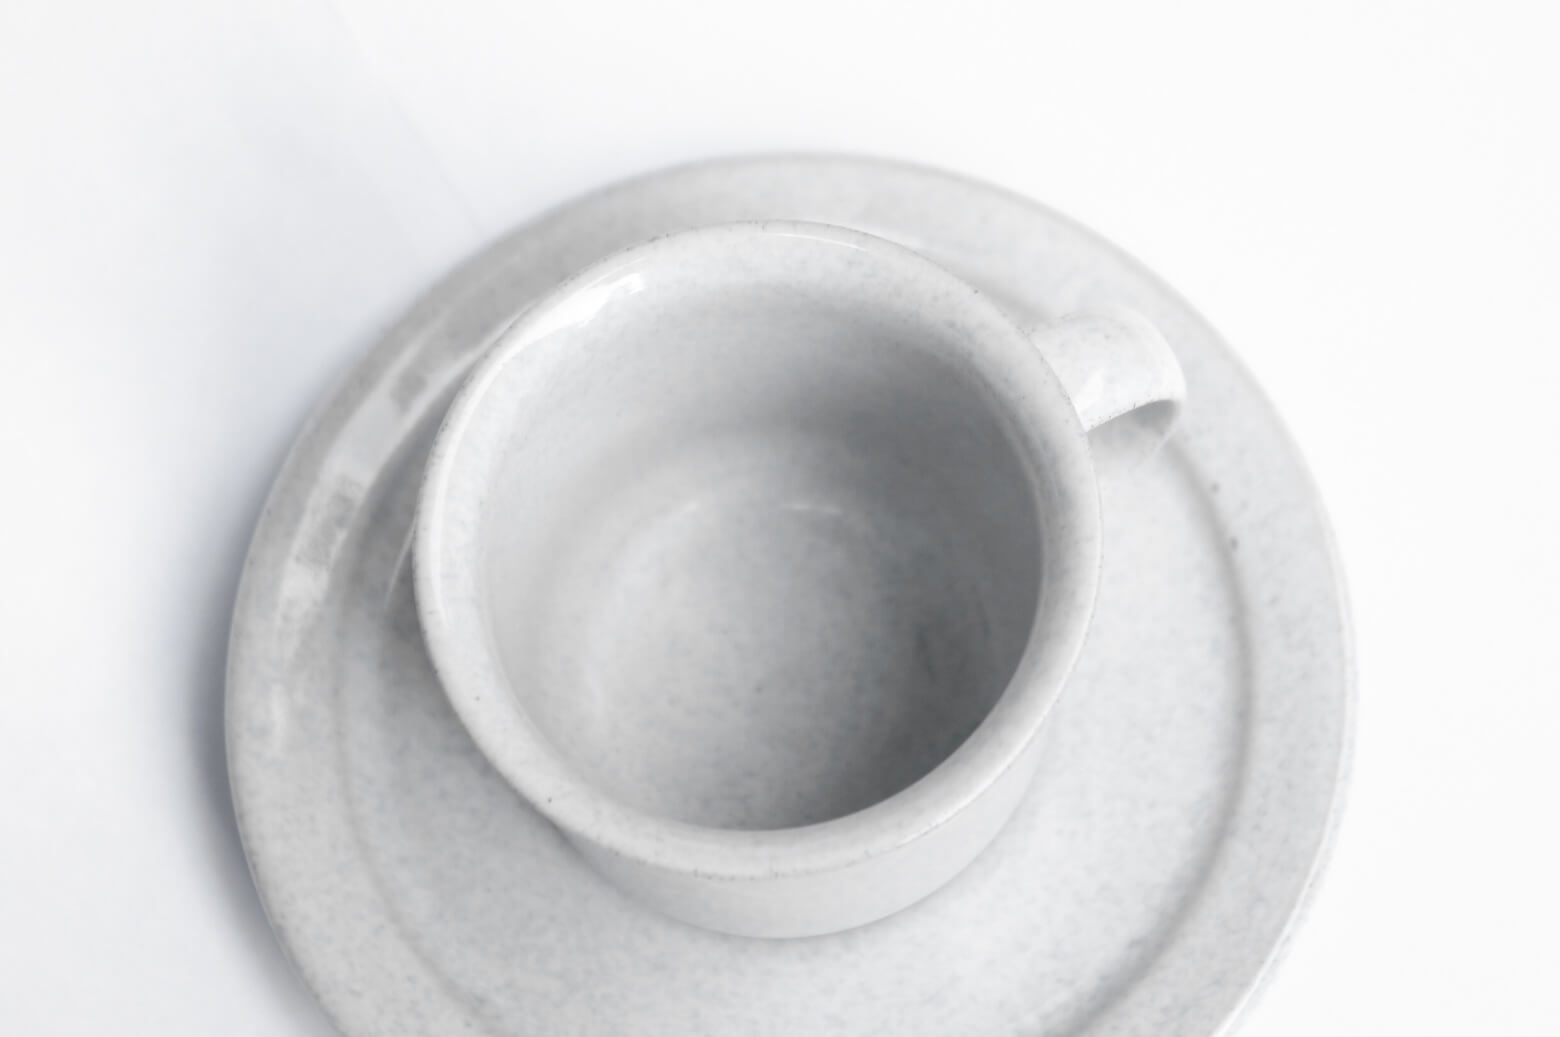 "Hoganas Keramik ""HARD"" Cup and Saucer/ホガナス ケラミック ""ハード"" カップ&ソーサー シグネ・ペーション・メリン スウェーデン 北欧食器 1"